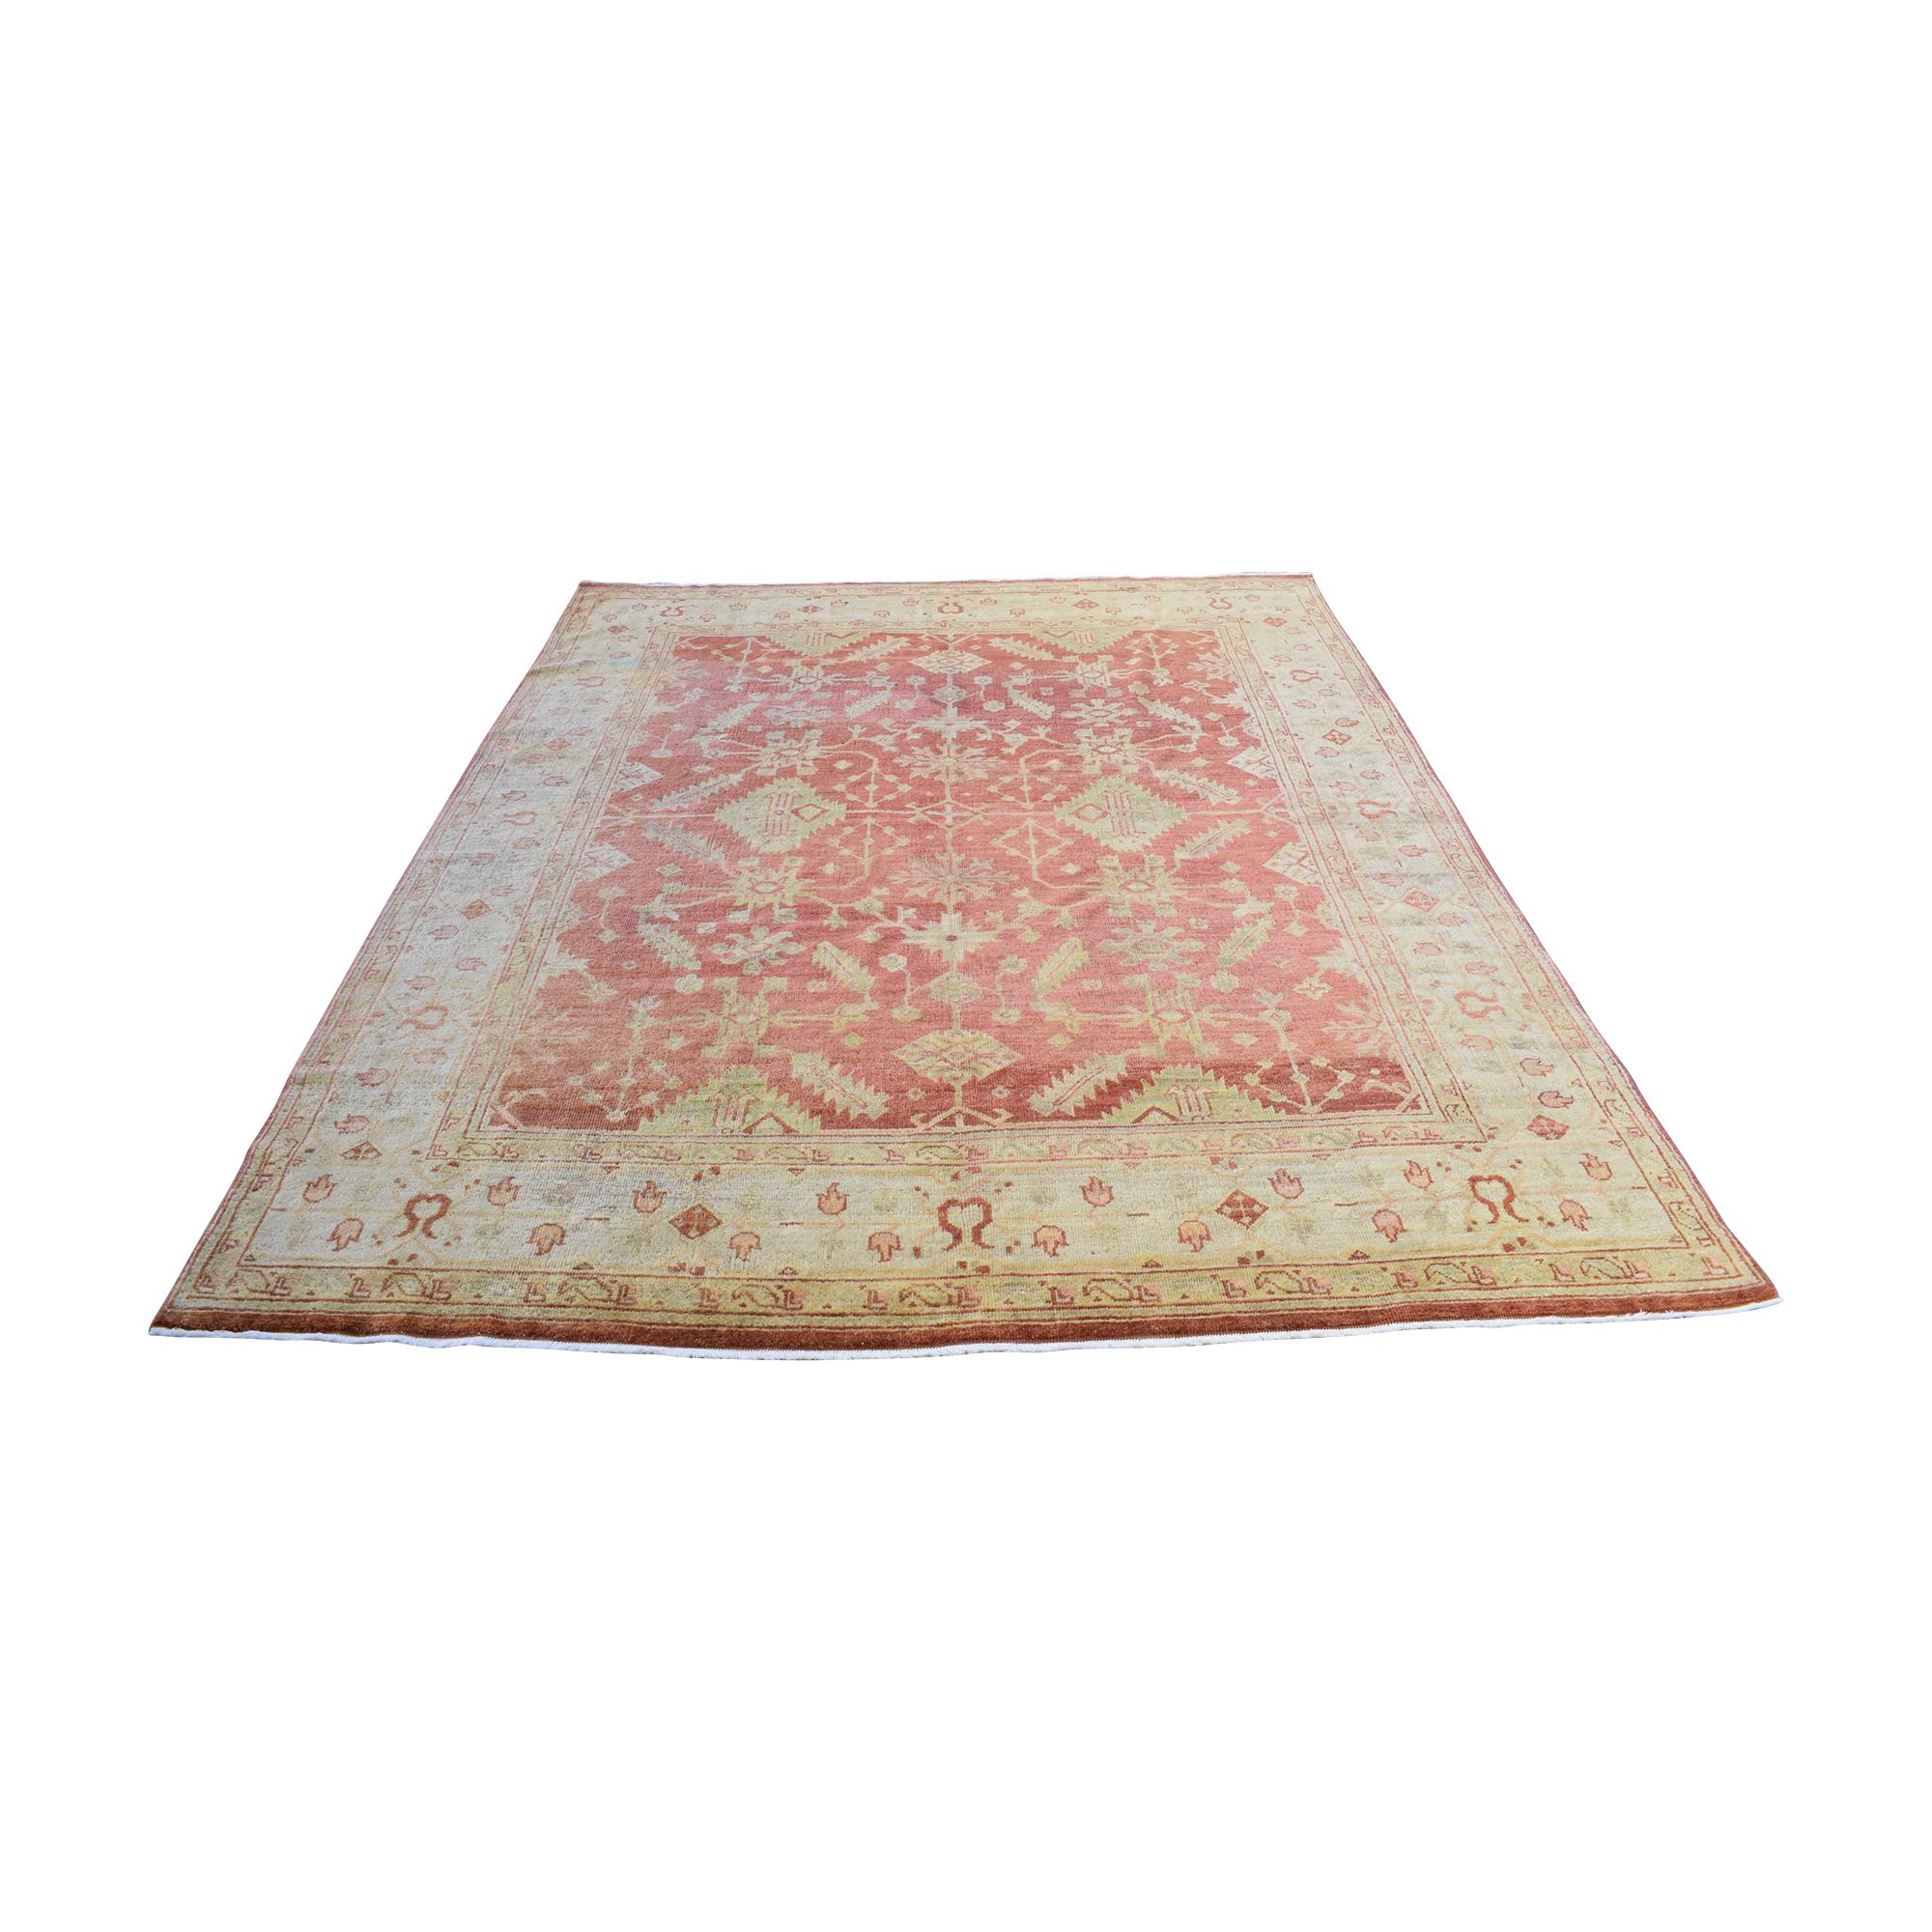 shop ABC Carpet & Home Area Rug ABC Carpet & Home Rugs